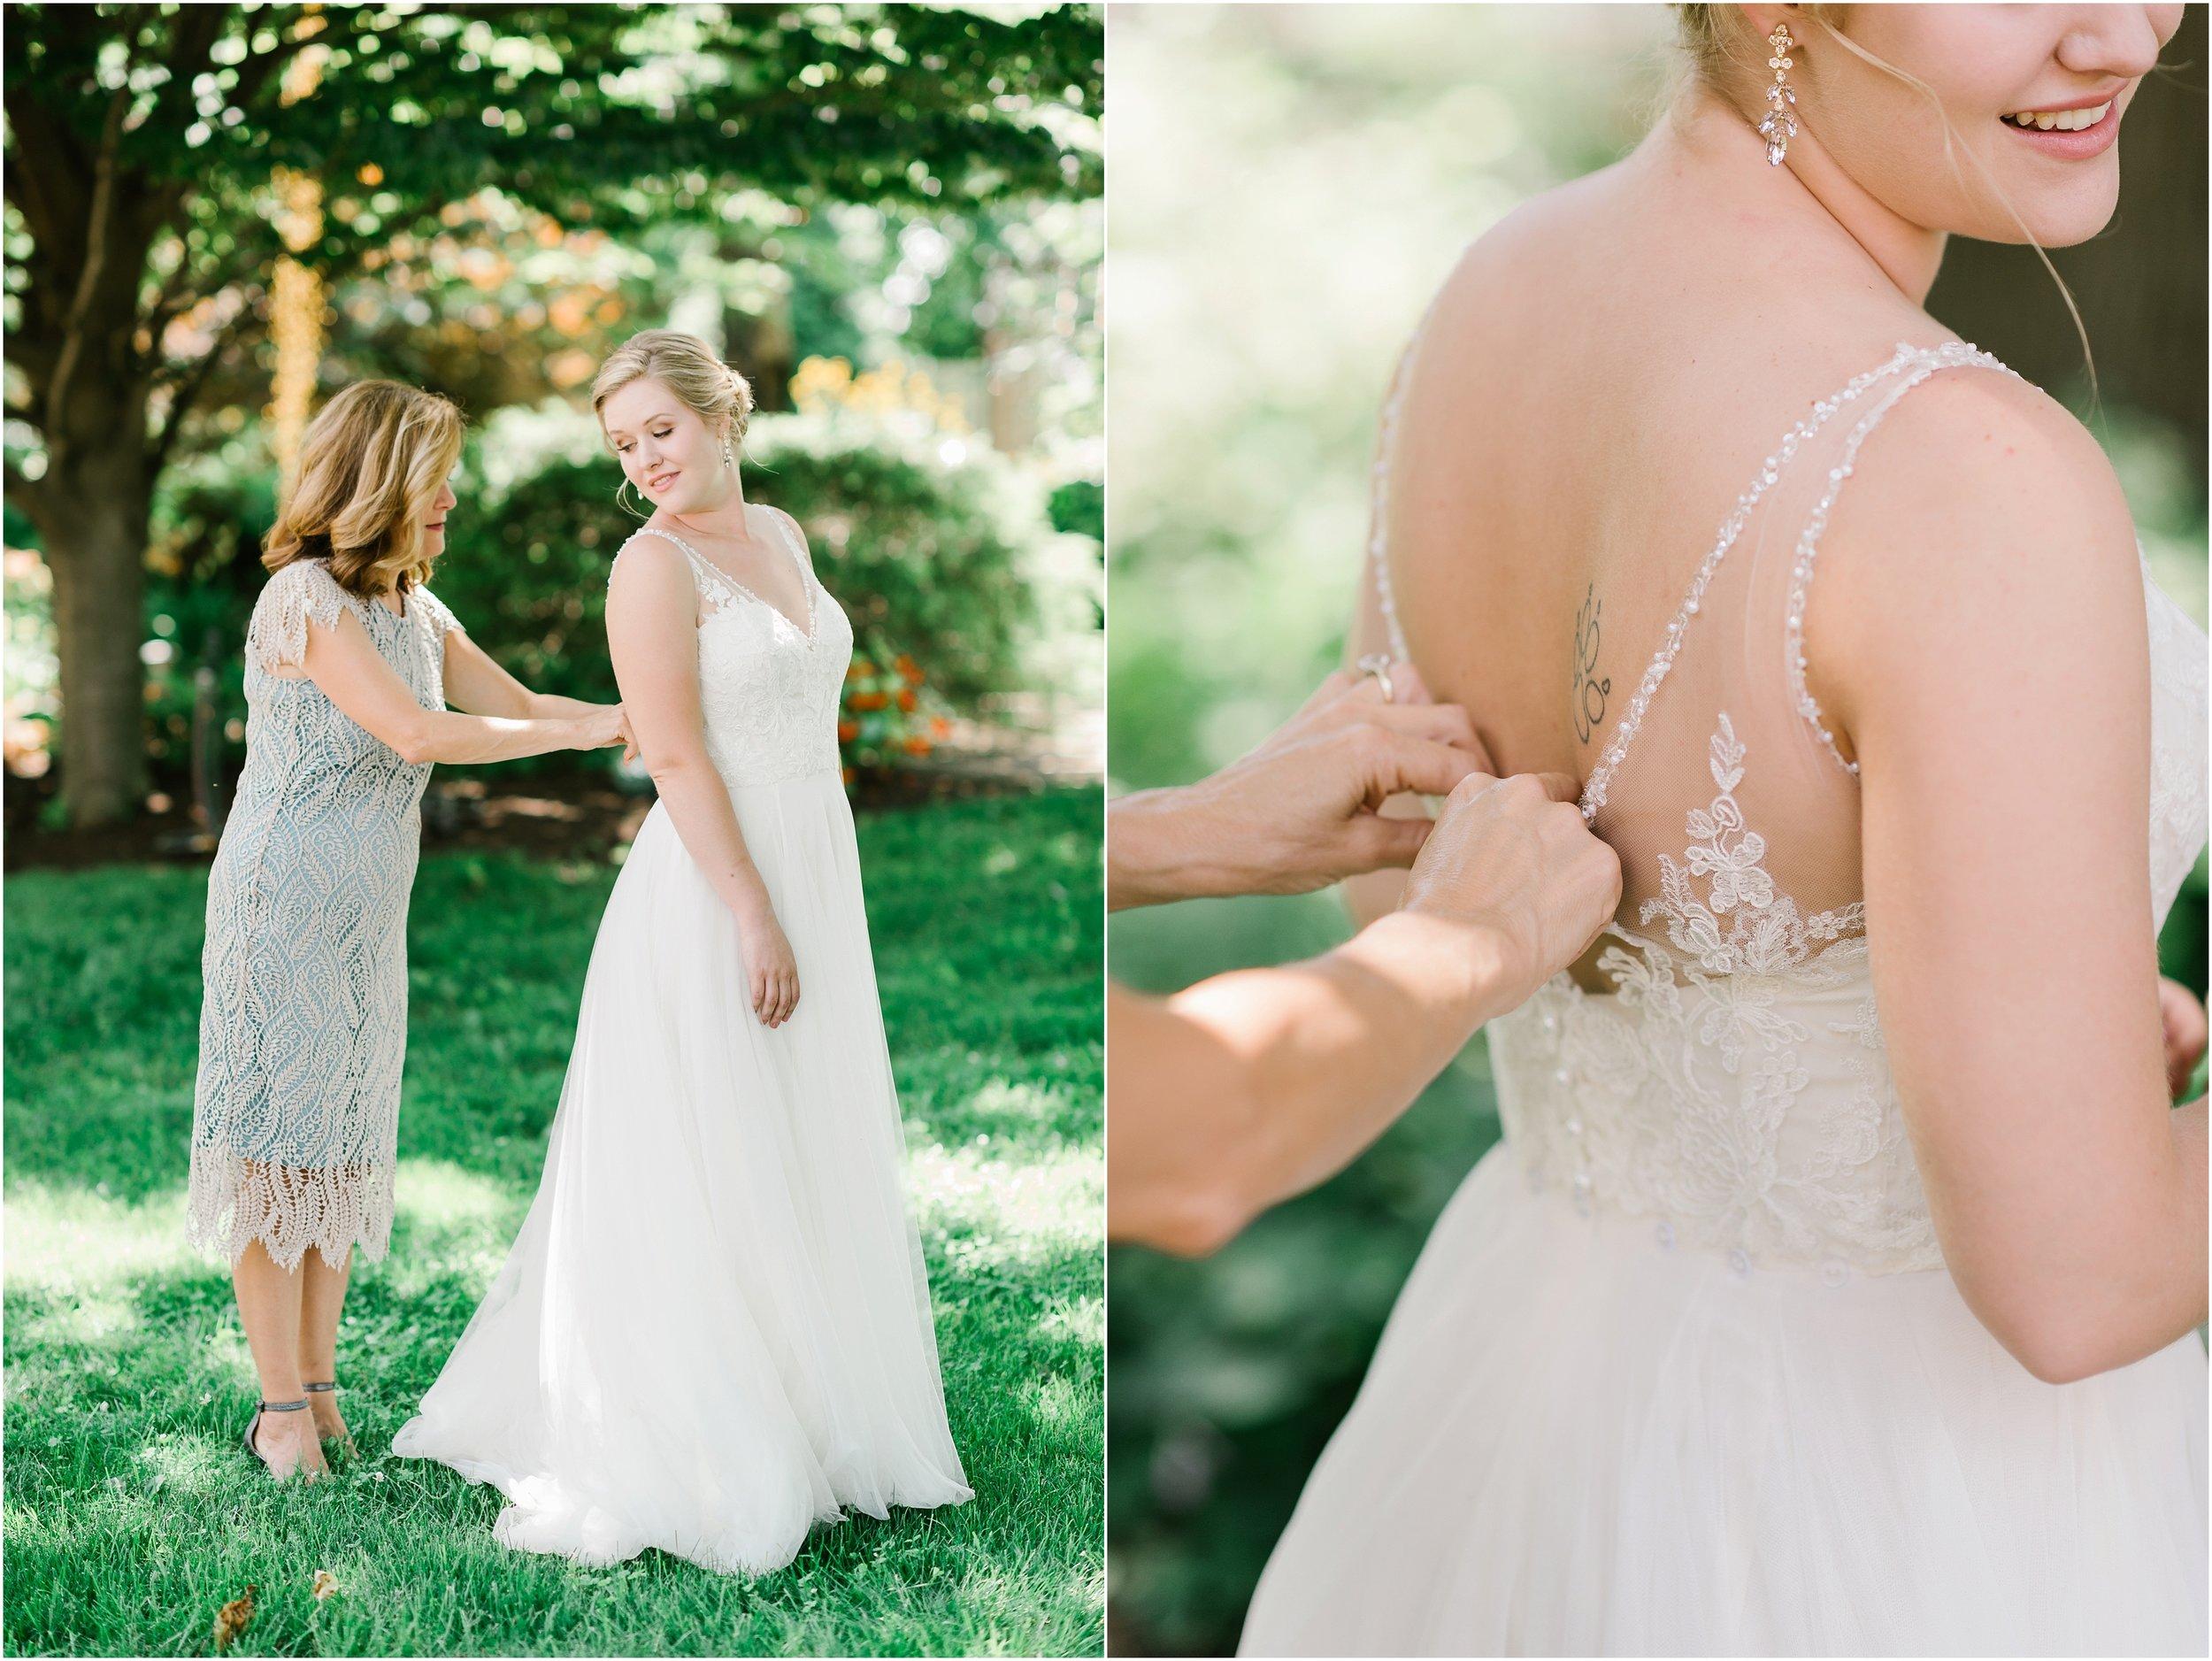 Rebecca_Shehorn_Photography_Indianapolis_Wedding_Photographer_8484.jpg